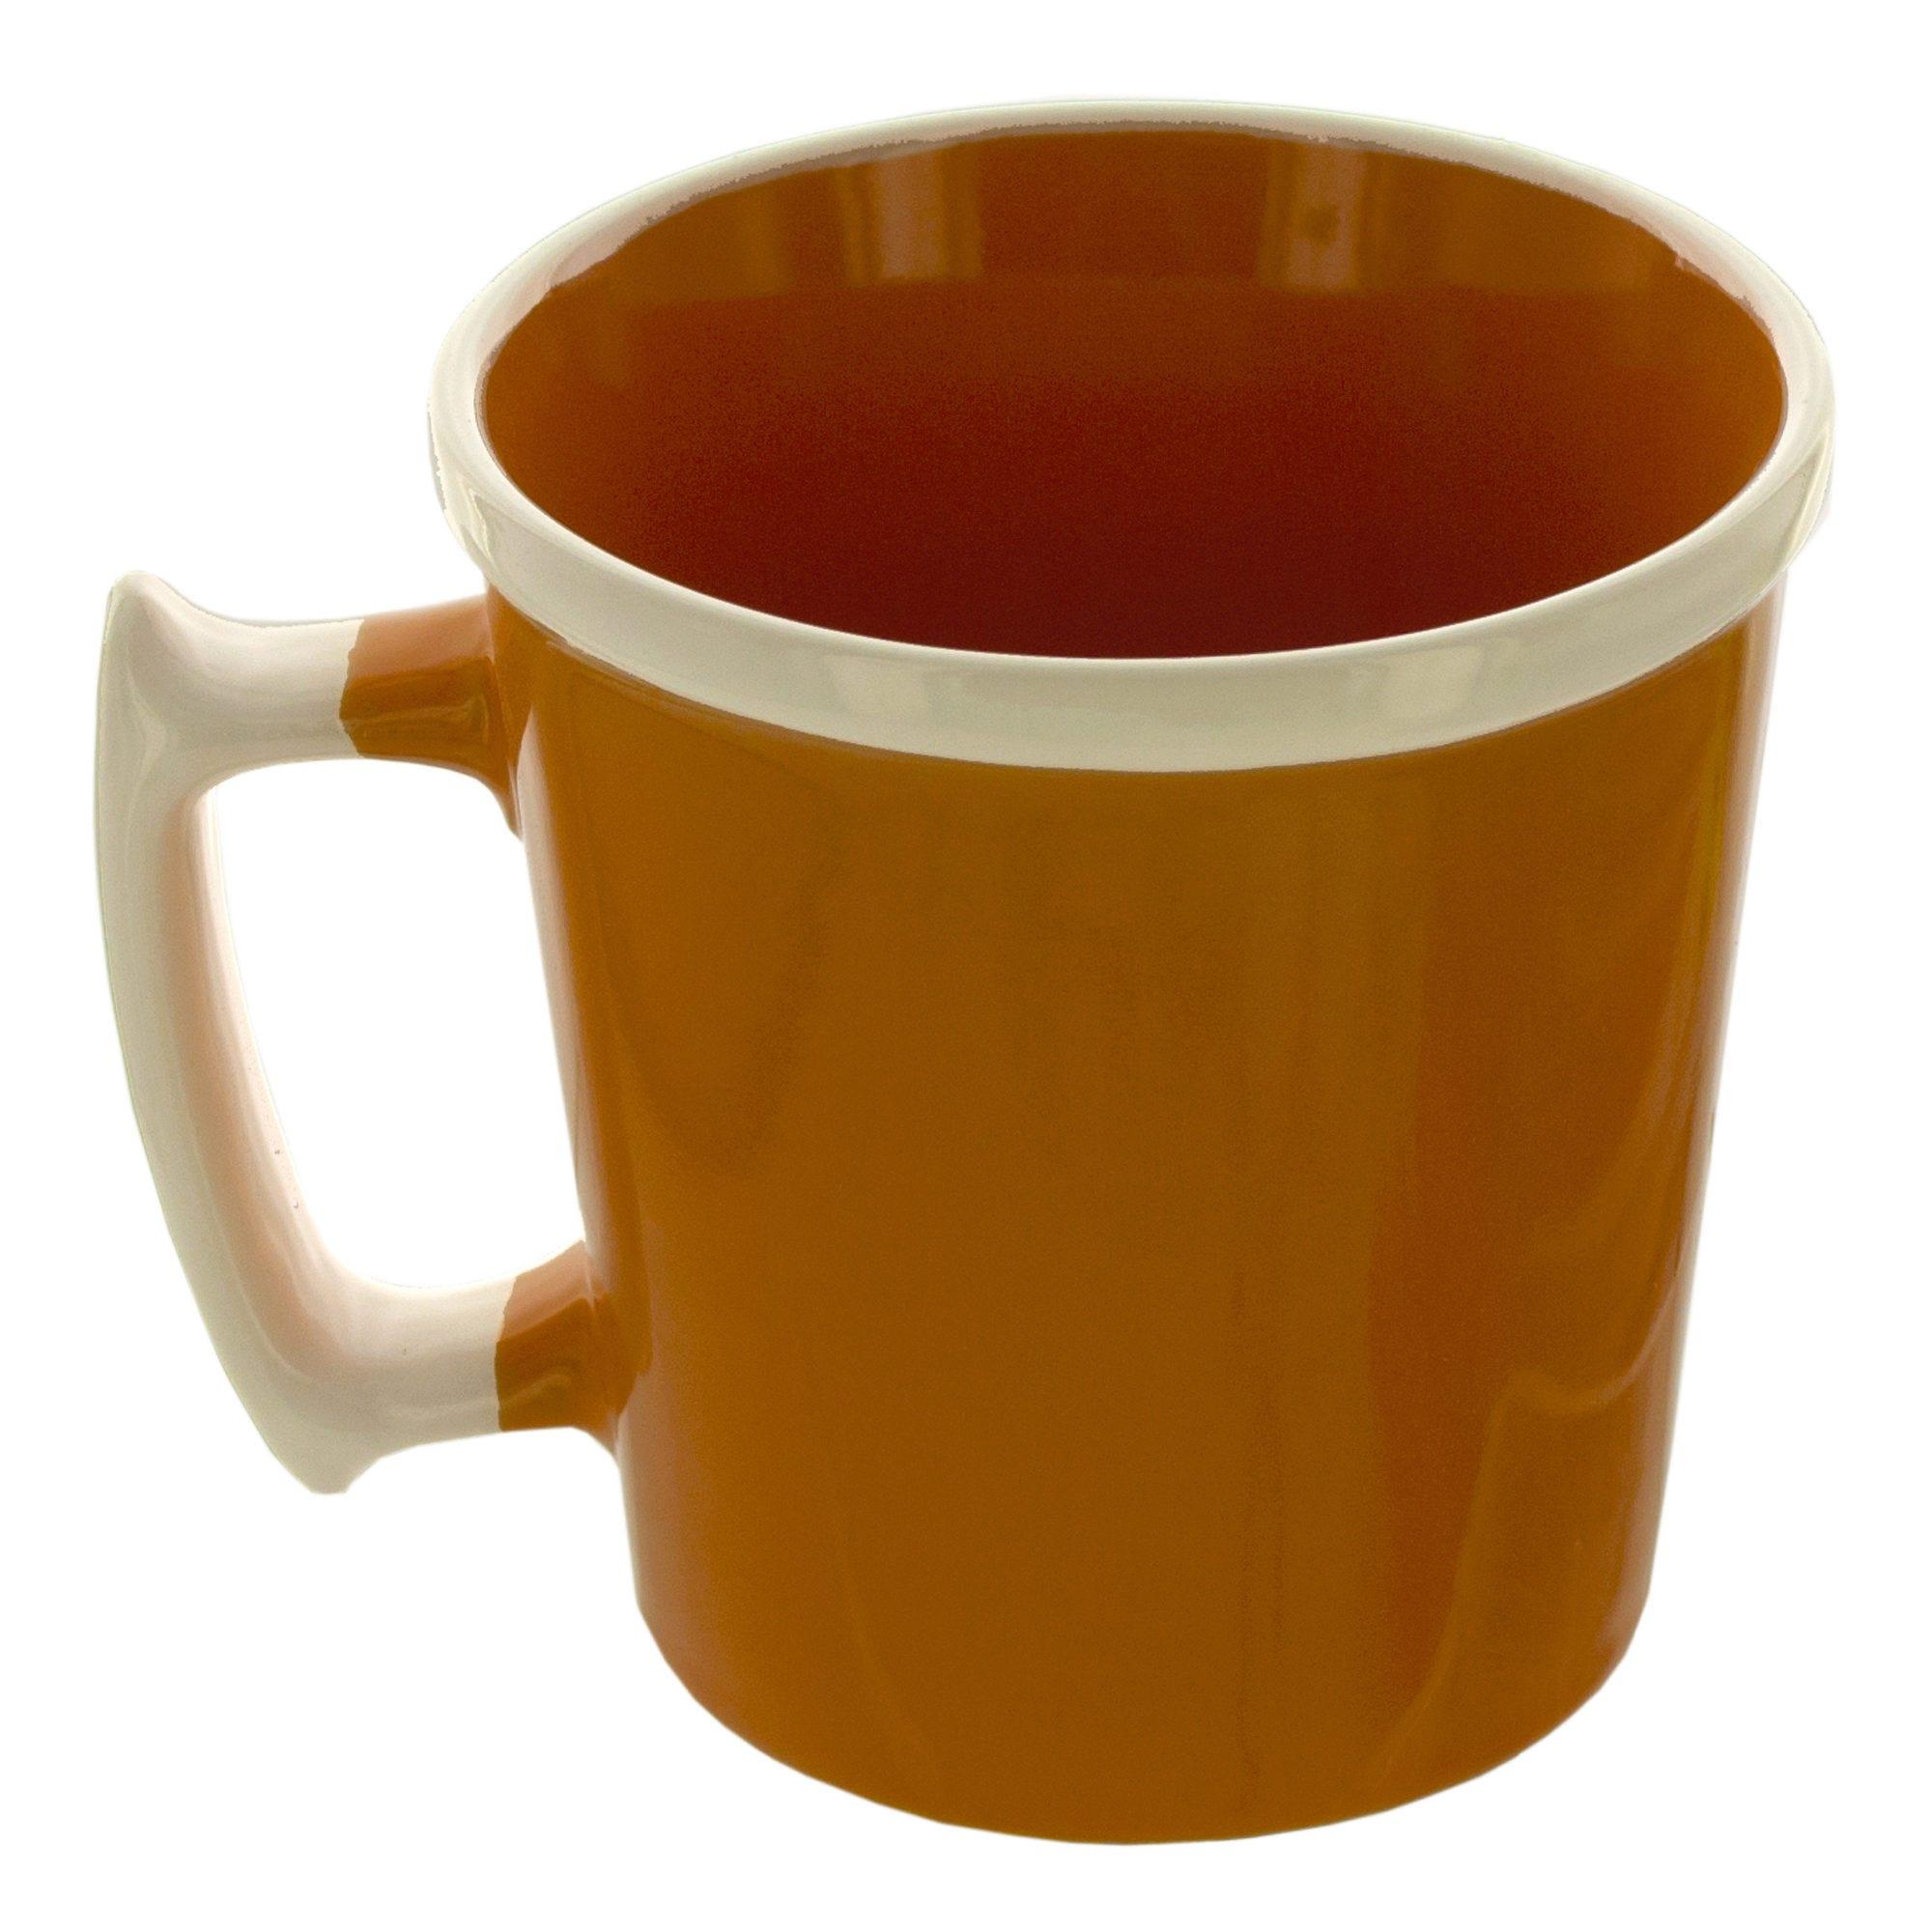 11 oz. Orange MUG with White Rim & Handle- Qty 24